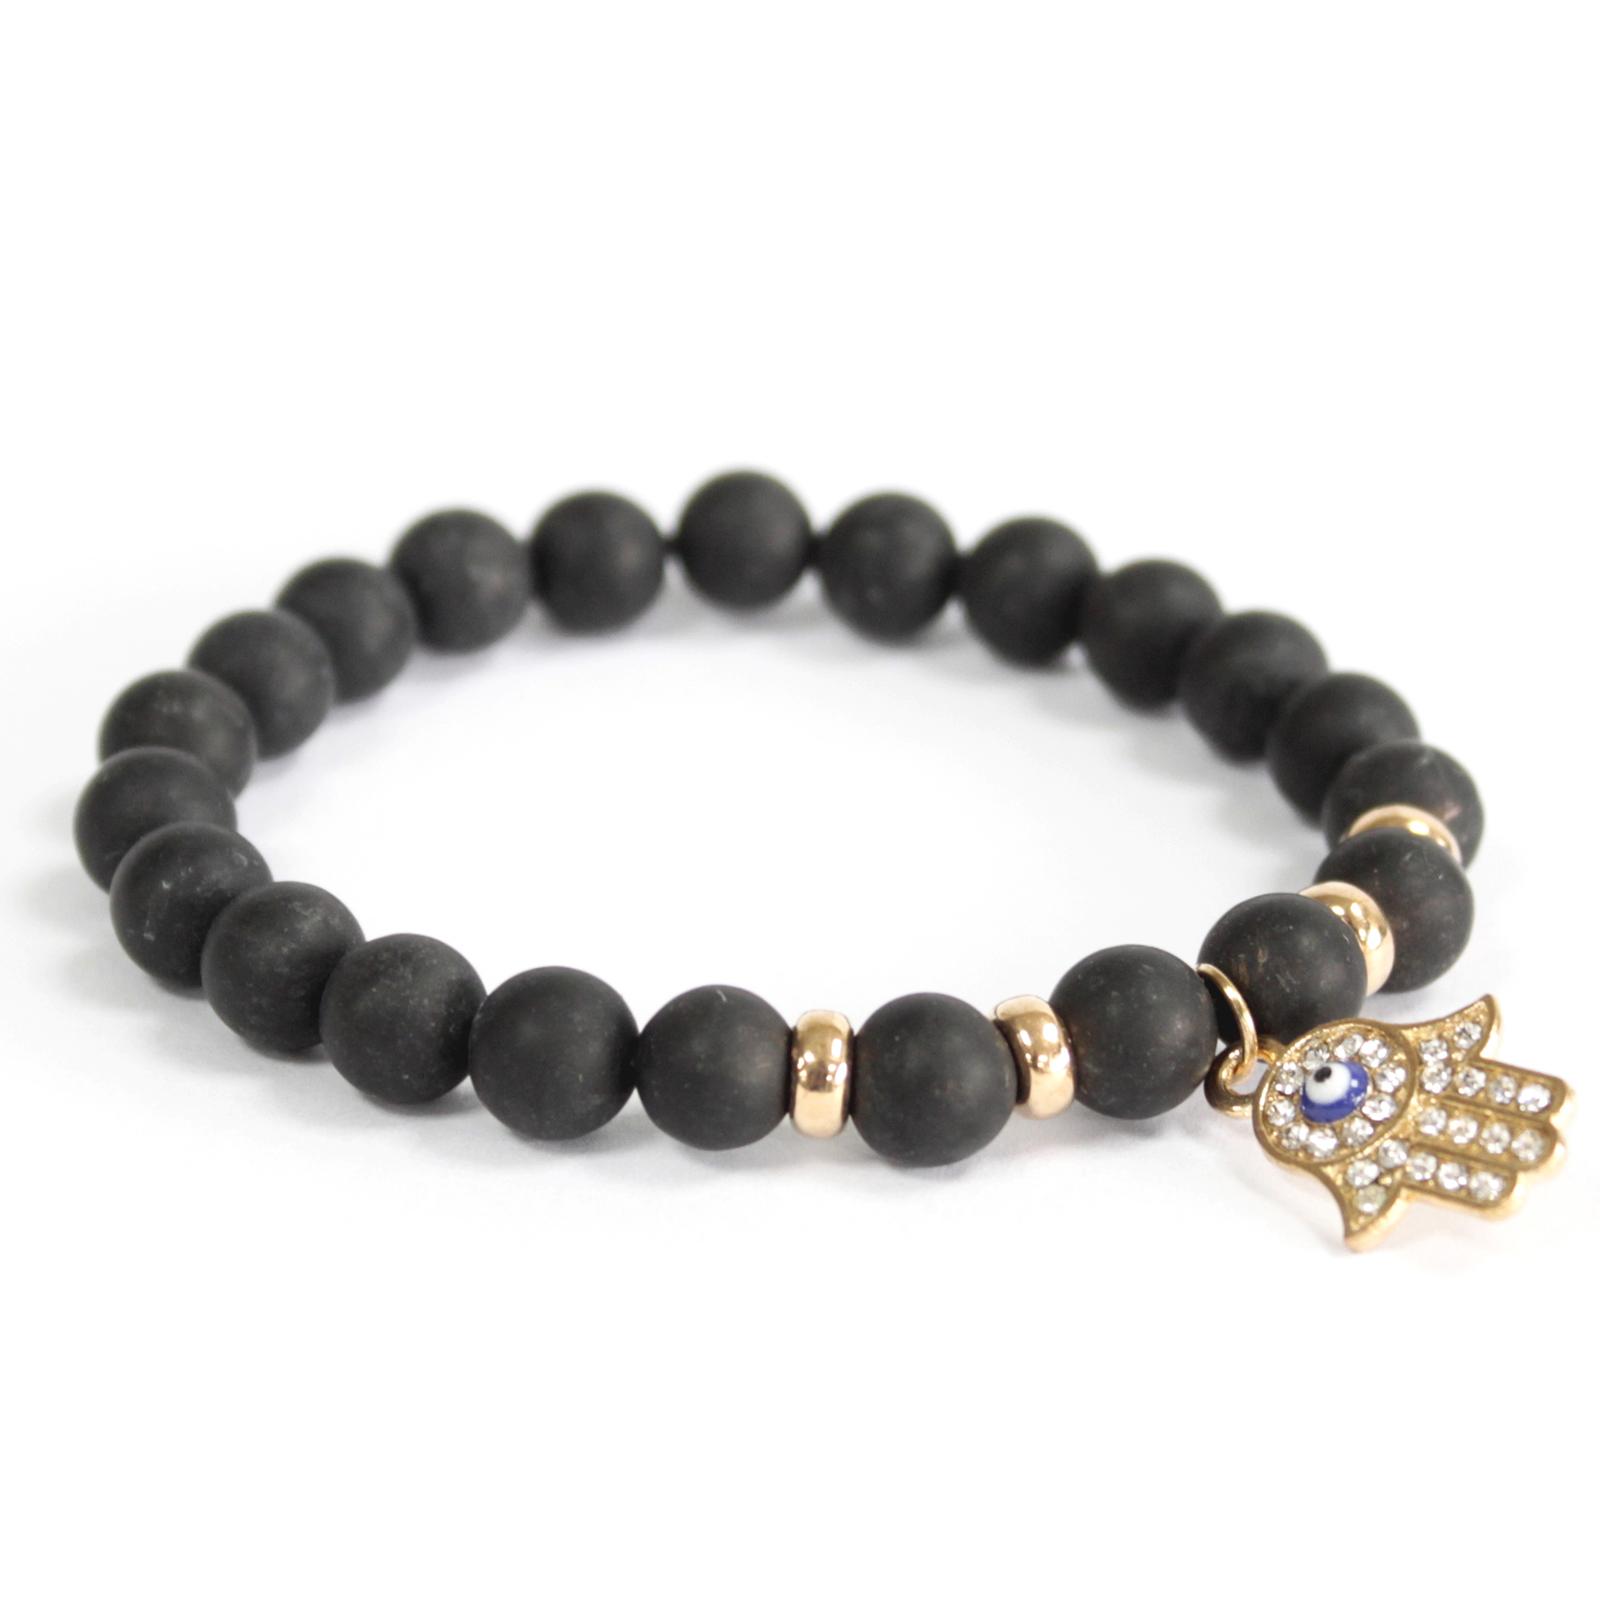 3x Hamsa / Black Agate - Gemstone Bracelet